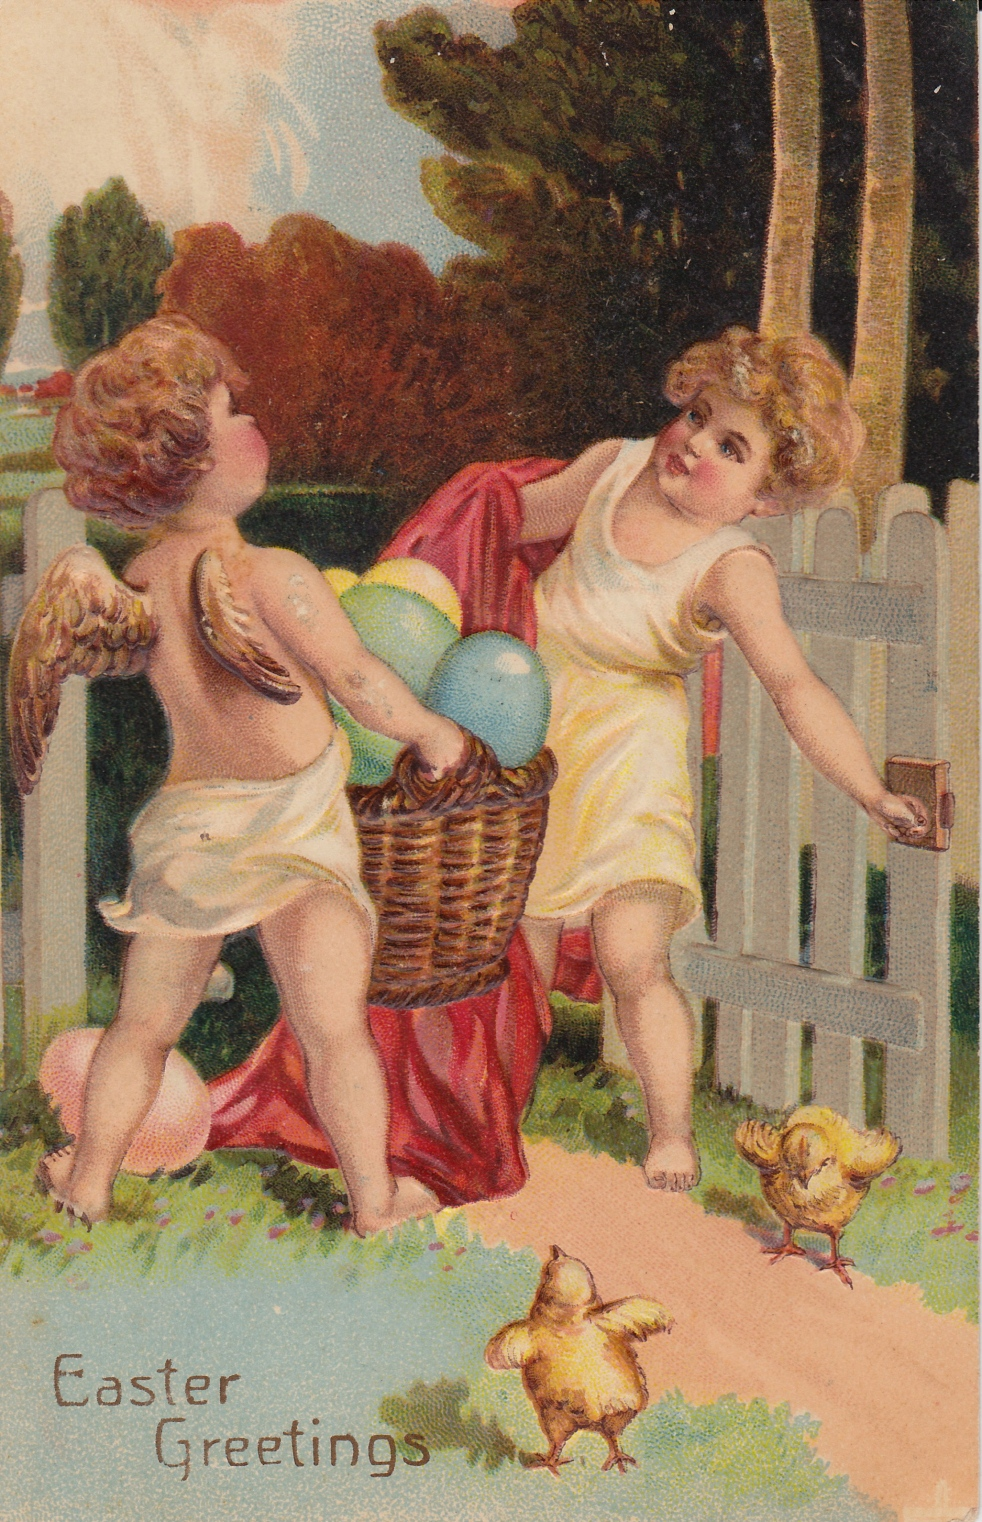 Wings of Whimsy: Easter Greetings - free for personal use #vintage #ephemera #printable #freebie #easter